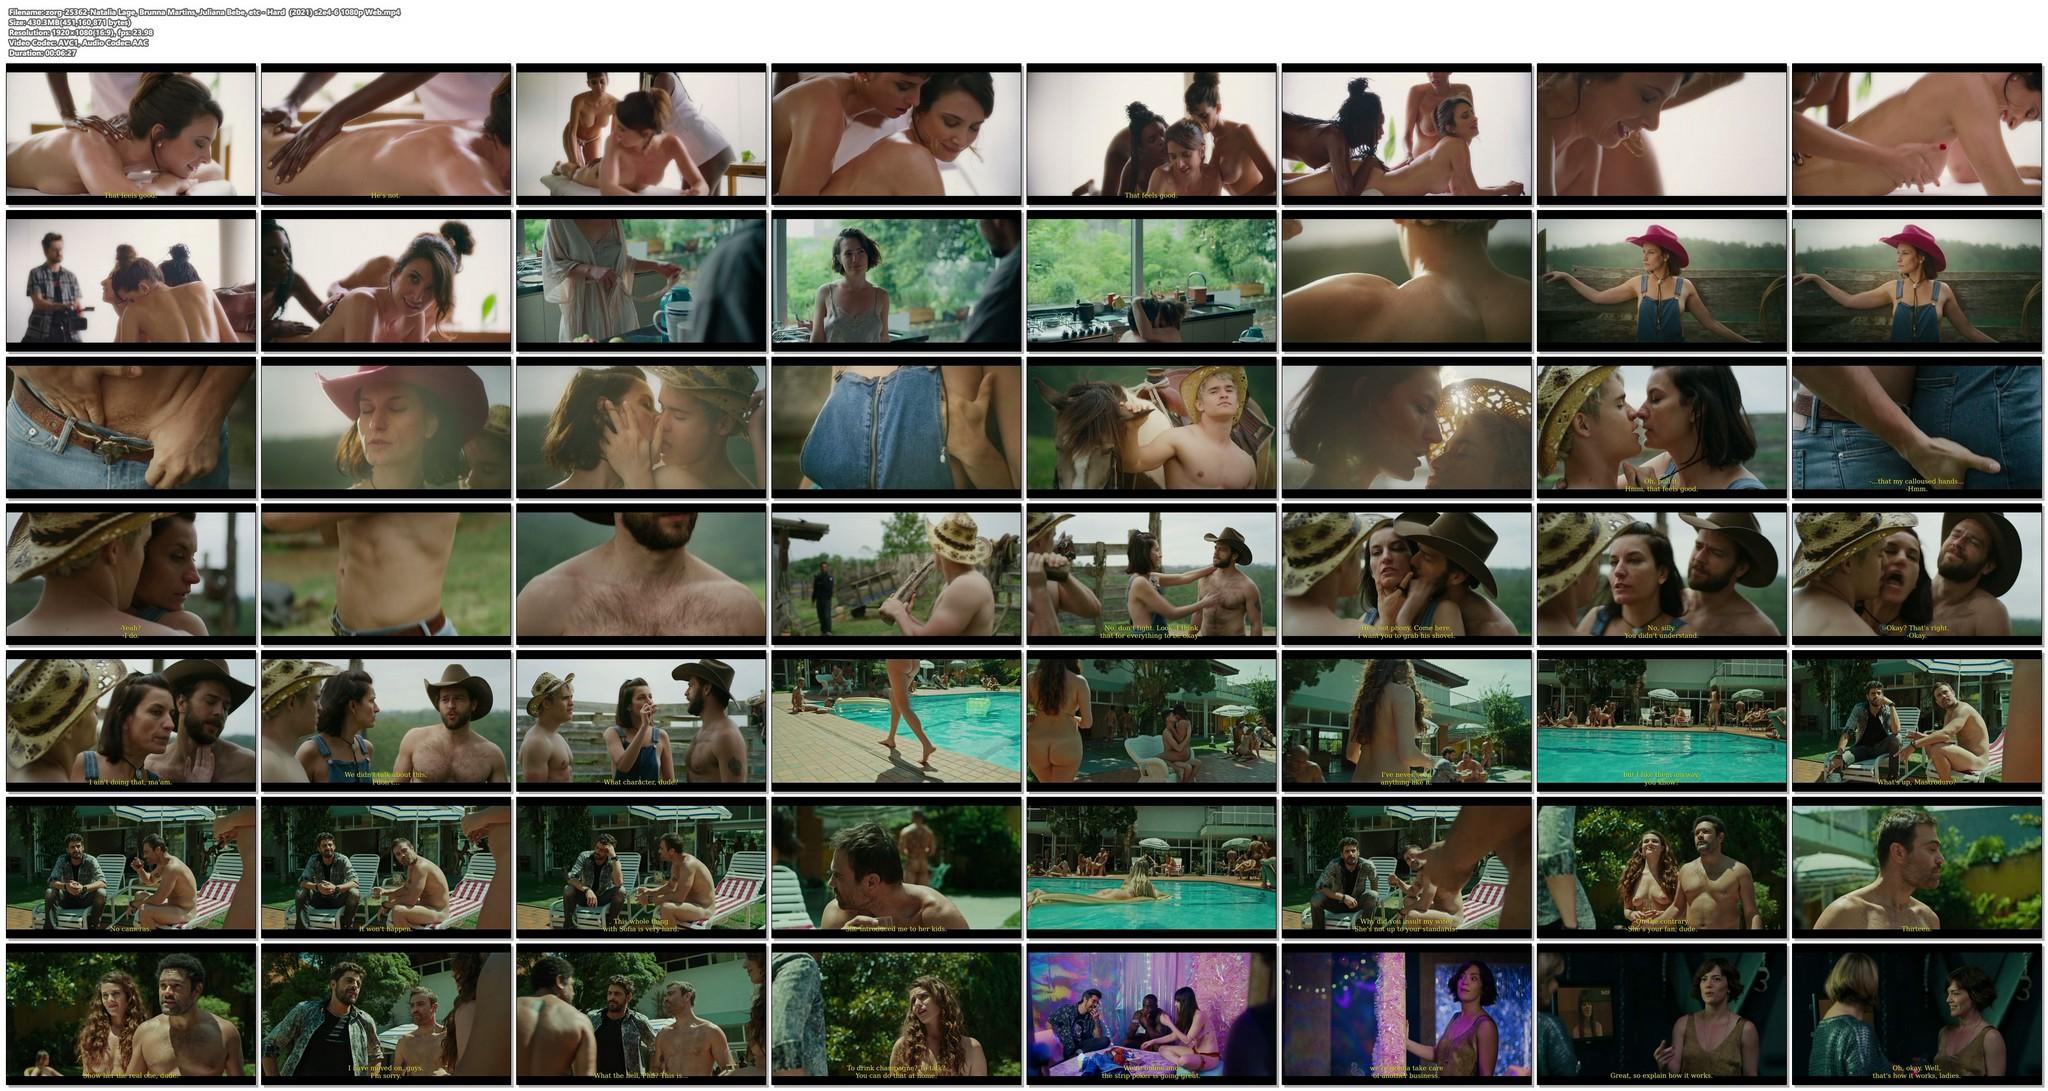 Natalia Lage nude sex Brunna Martins Juliana Bebe and oters nude too Hard 2021 s2e4 6 1080p Web 17